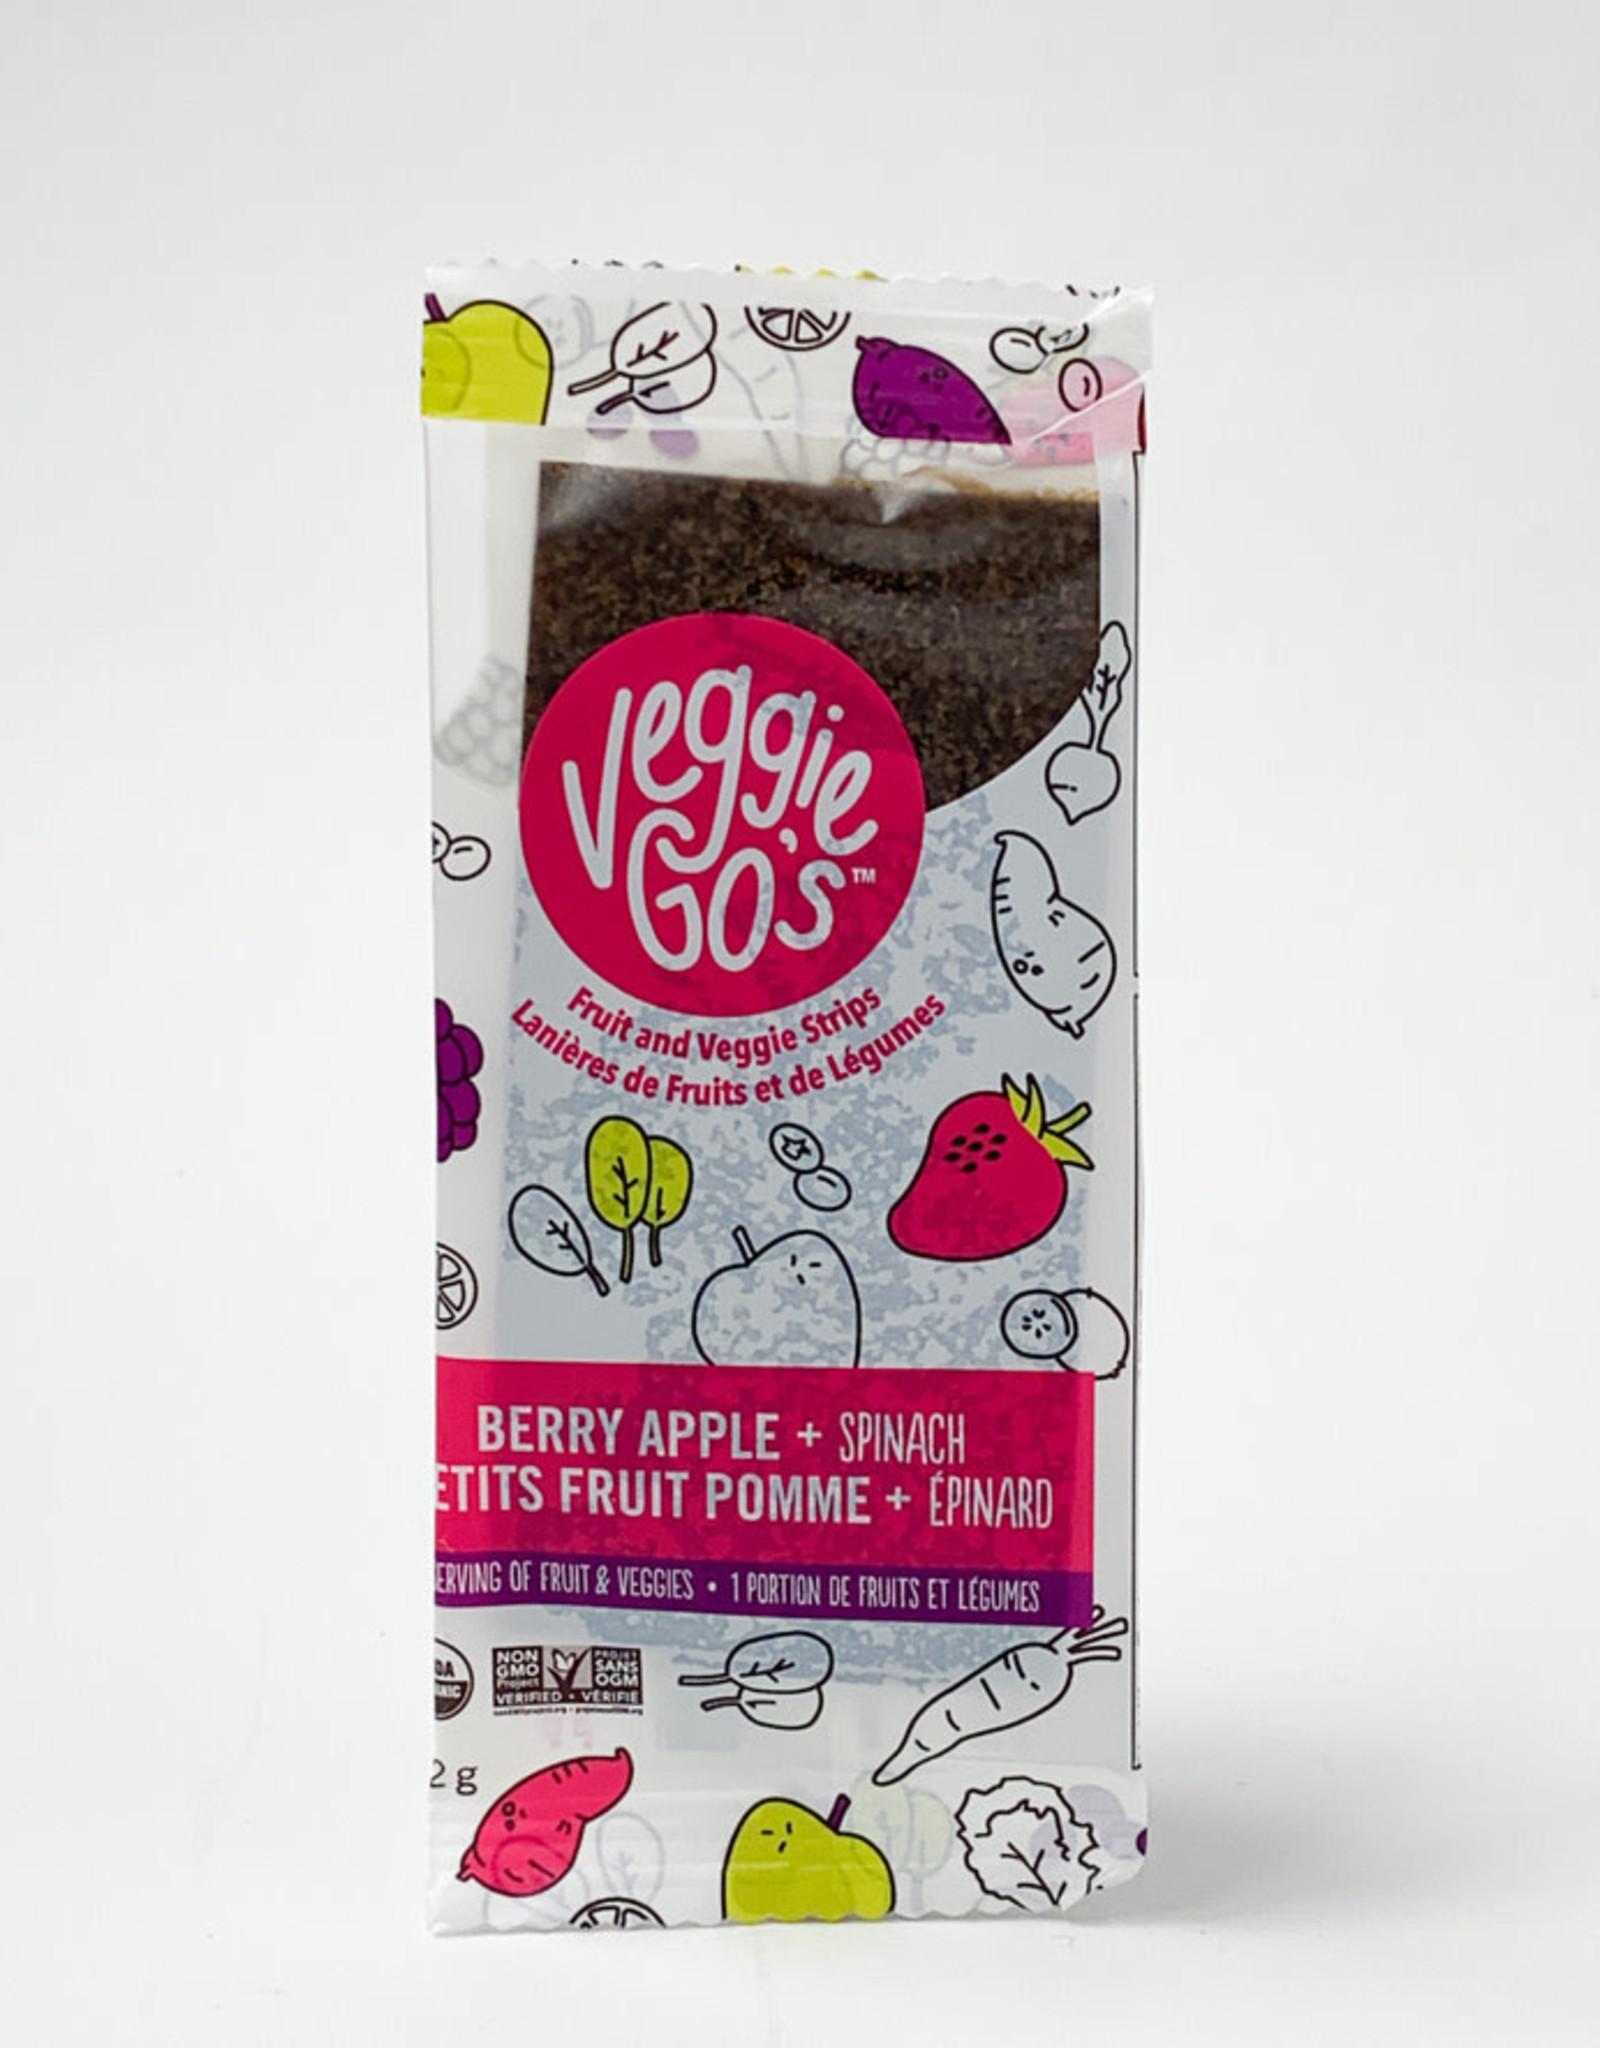 Veggie Gos Veggie Gos - Strips, Organic Berry Spinach and Apple Strips